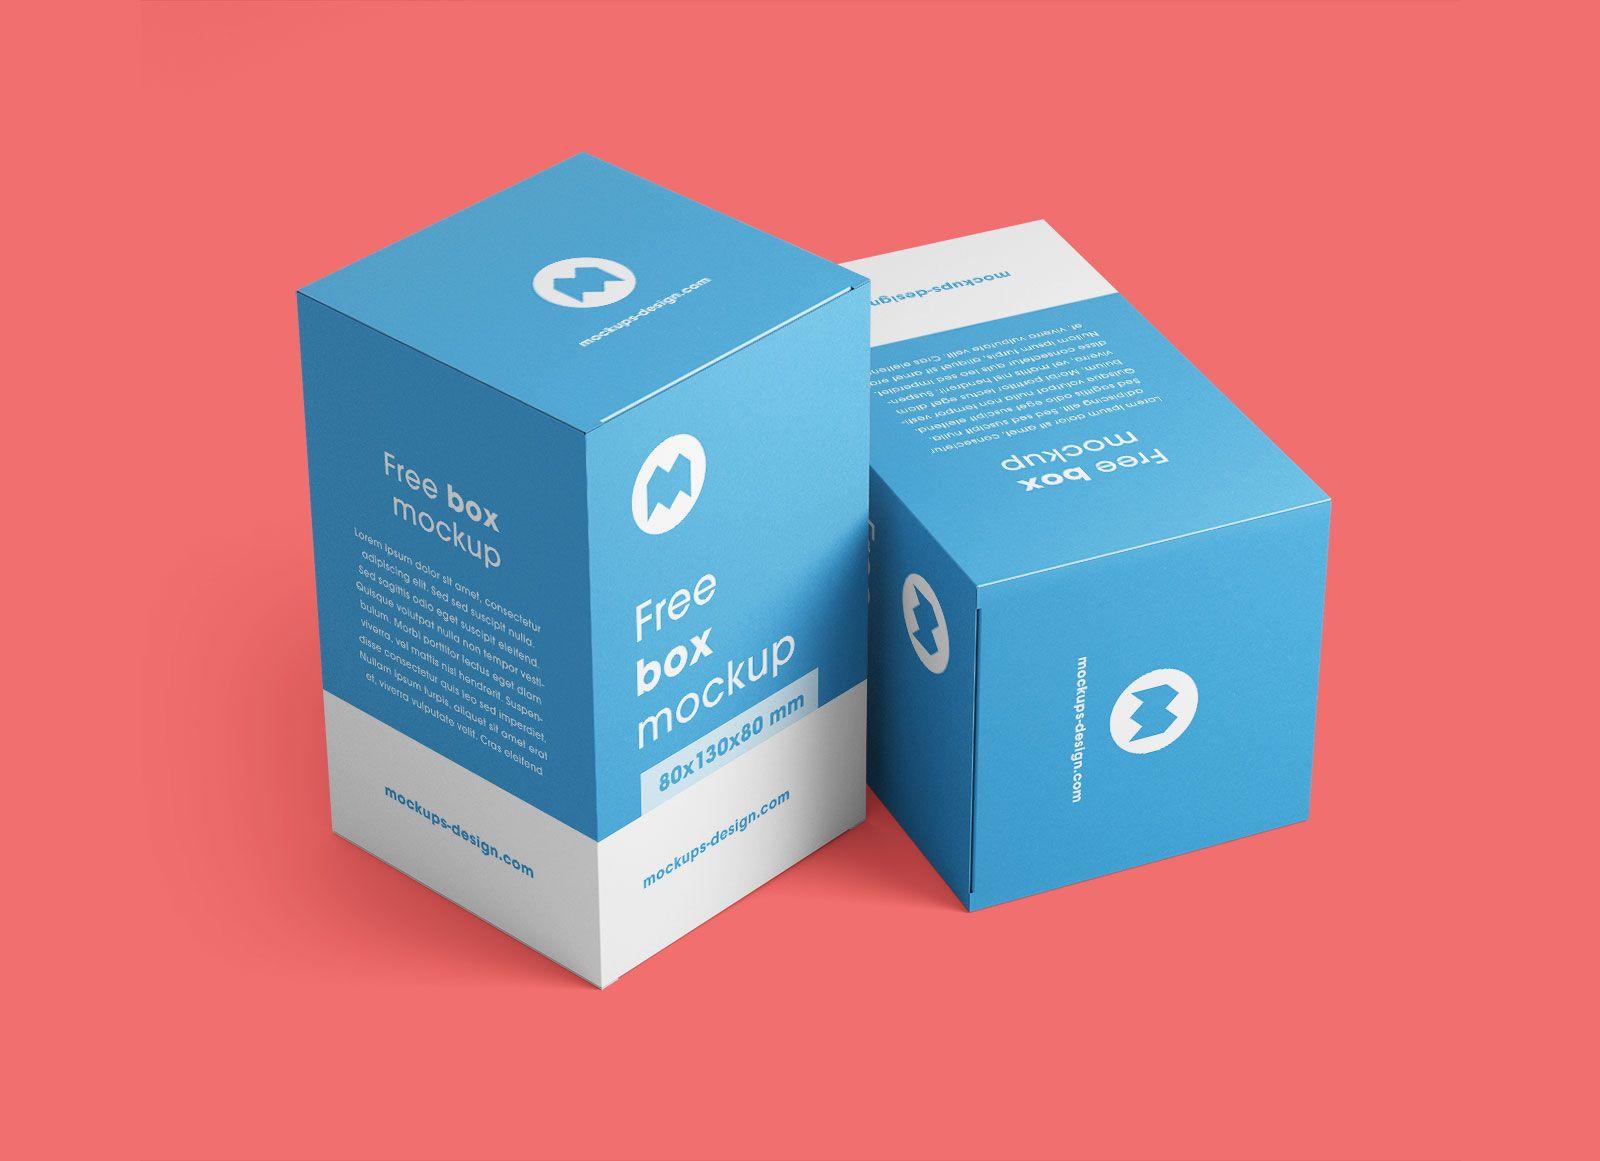 Cuboid Shape 3d Rendered Box Packaging Mockup To Showcase Blister Medicine Syrup Bottle Packaging Scent Box Packagi Packaging Mockup Box Packaging Box Mockup